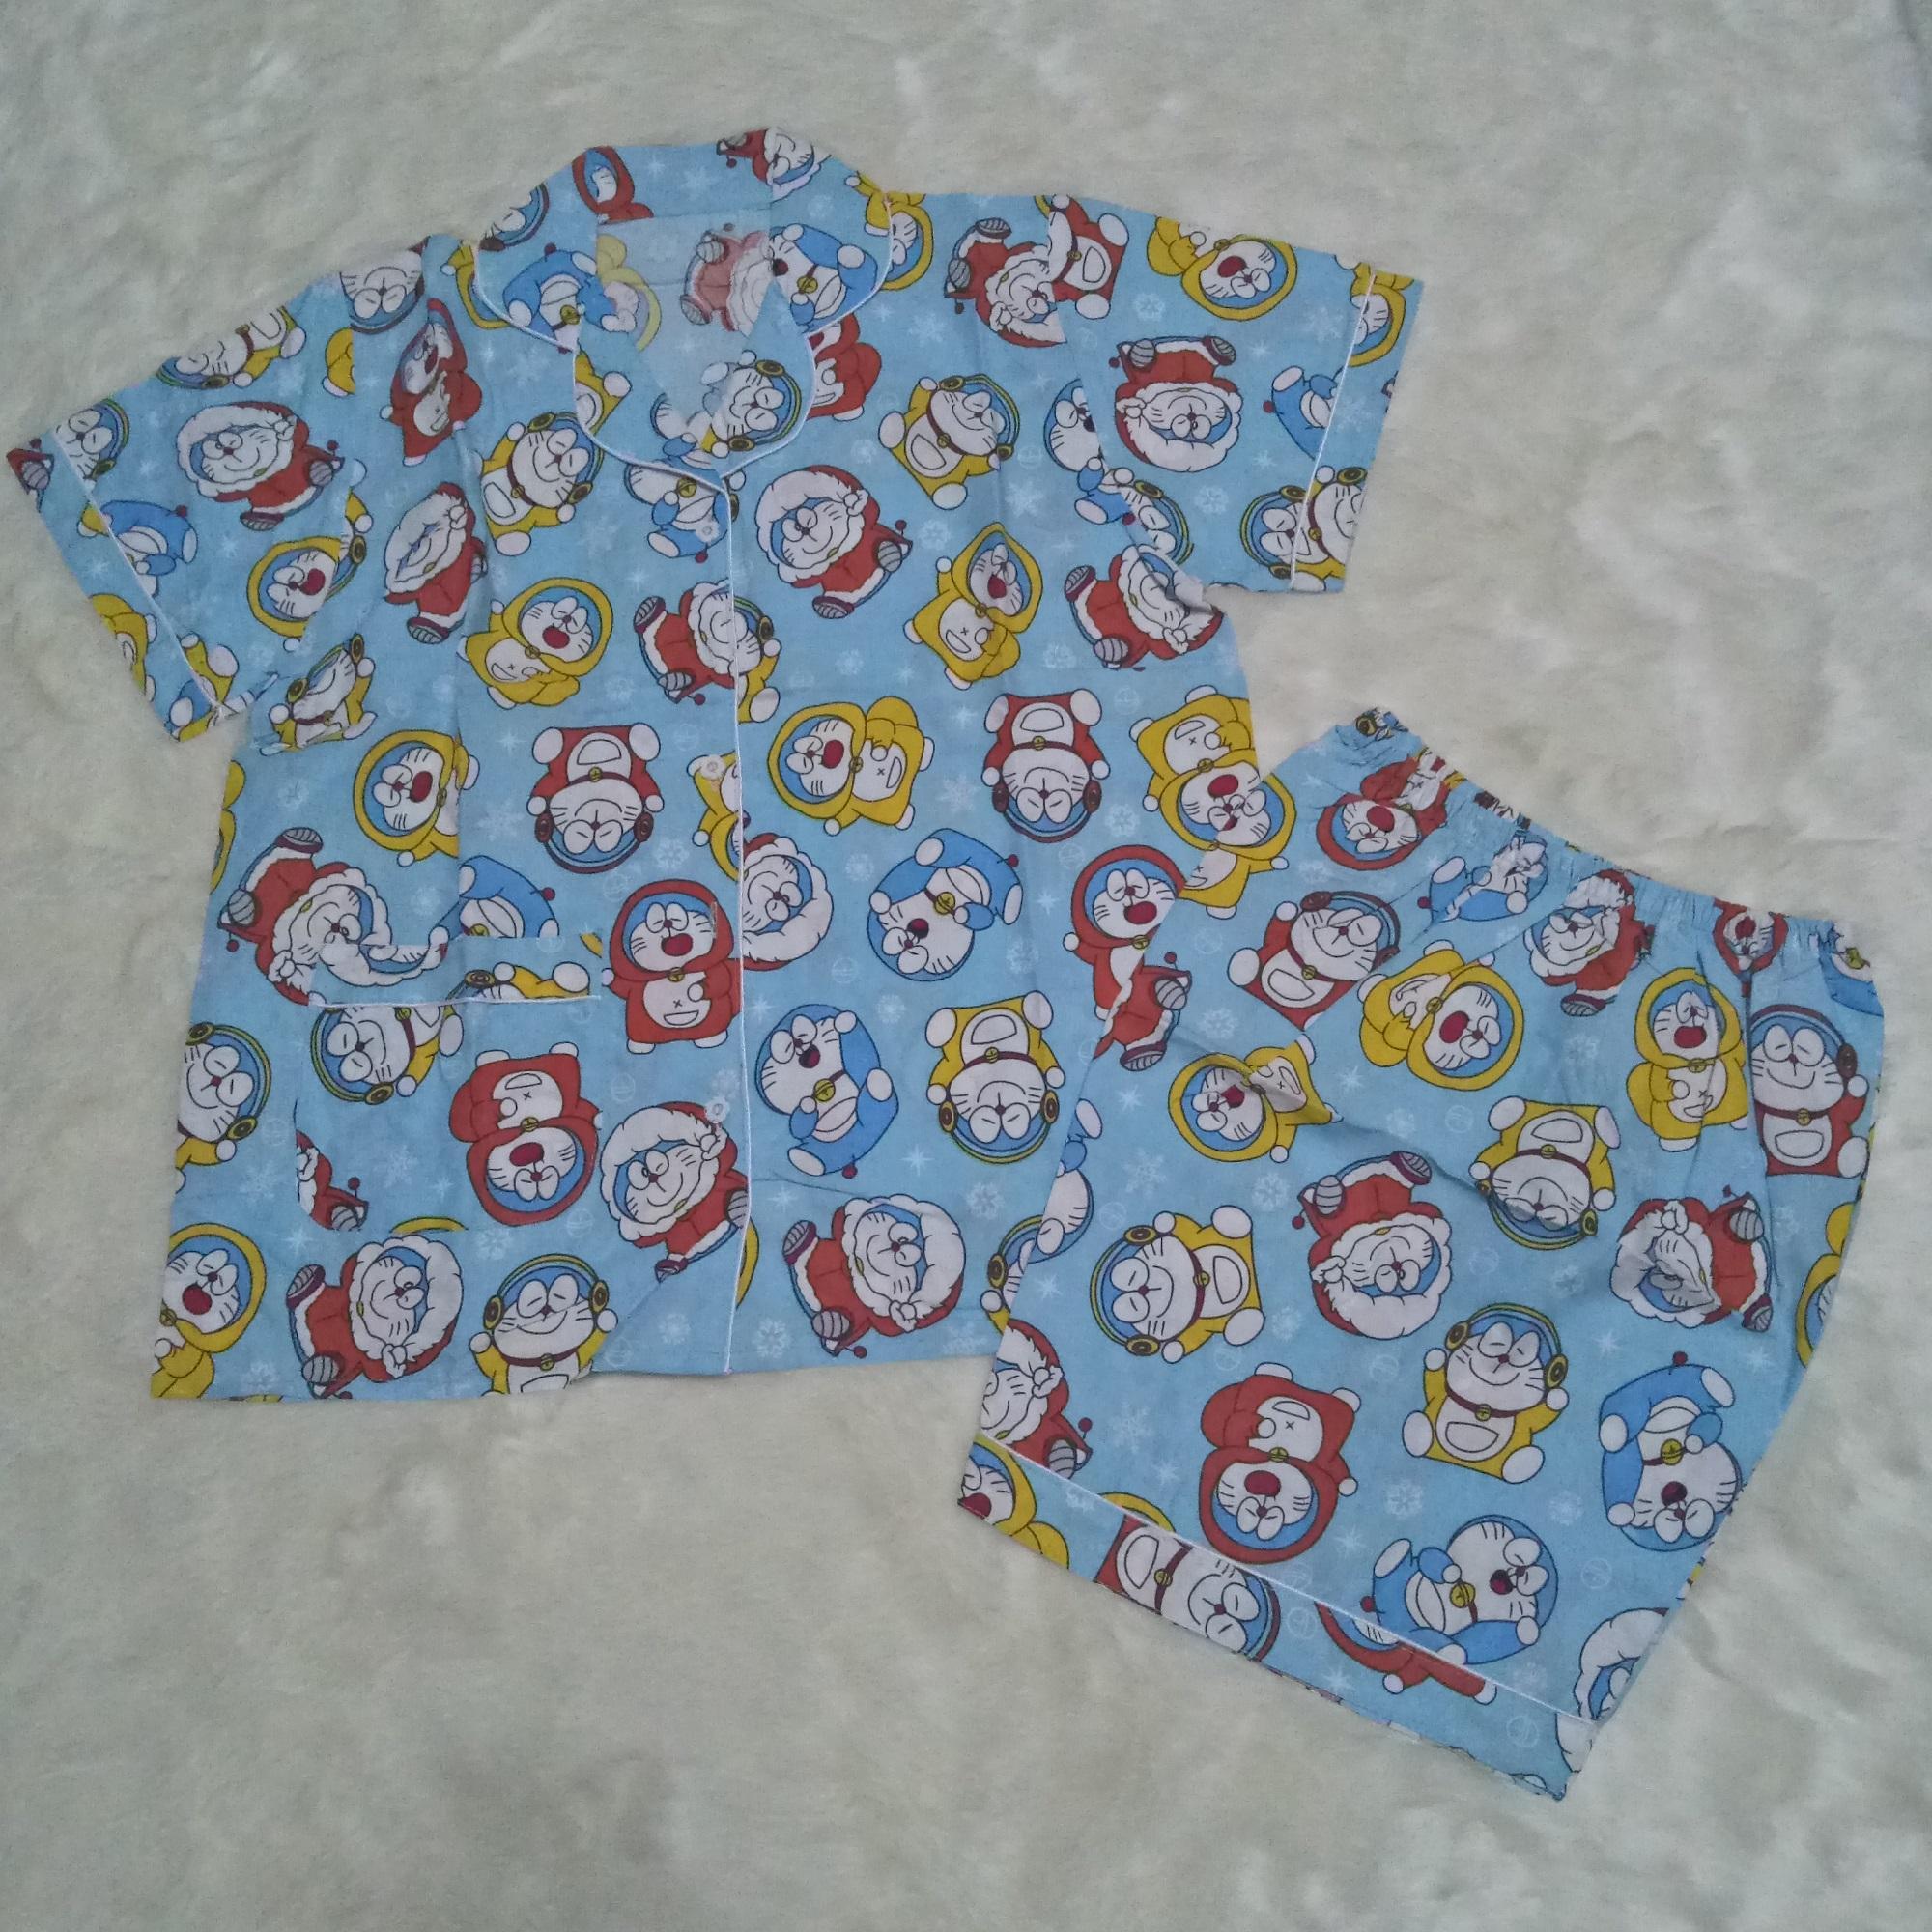 Katalog Baju Gamis Doraemon Dewasa Termurah Hijabisa Katalig Piyama Murah Hp Winter